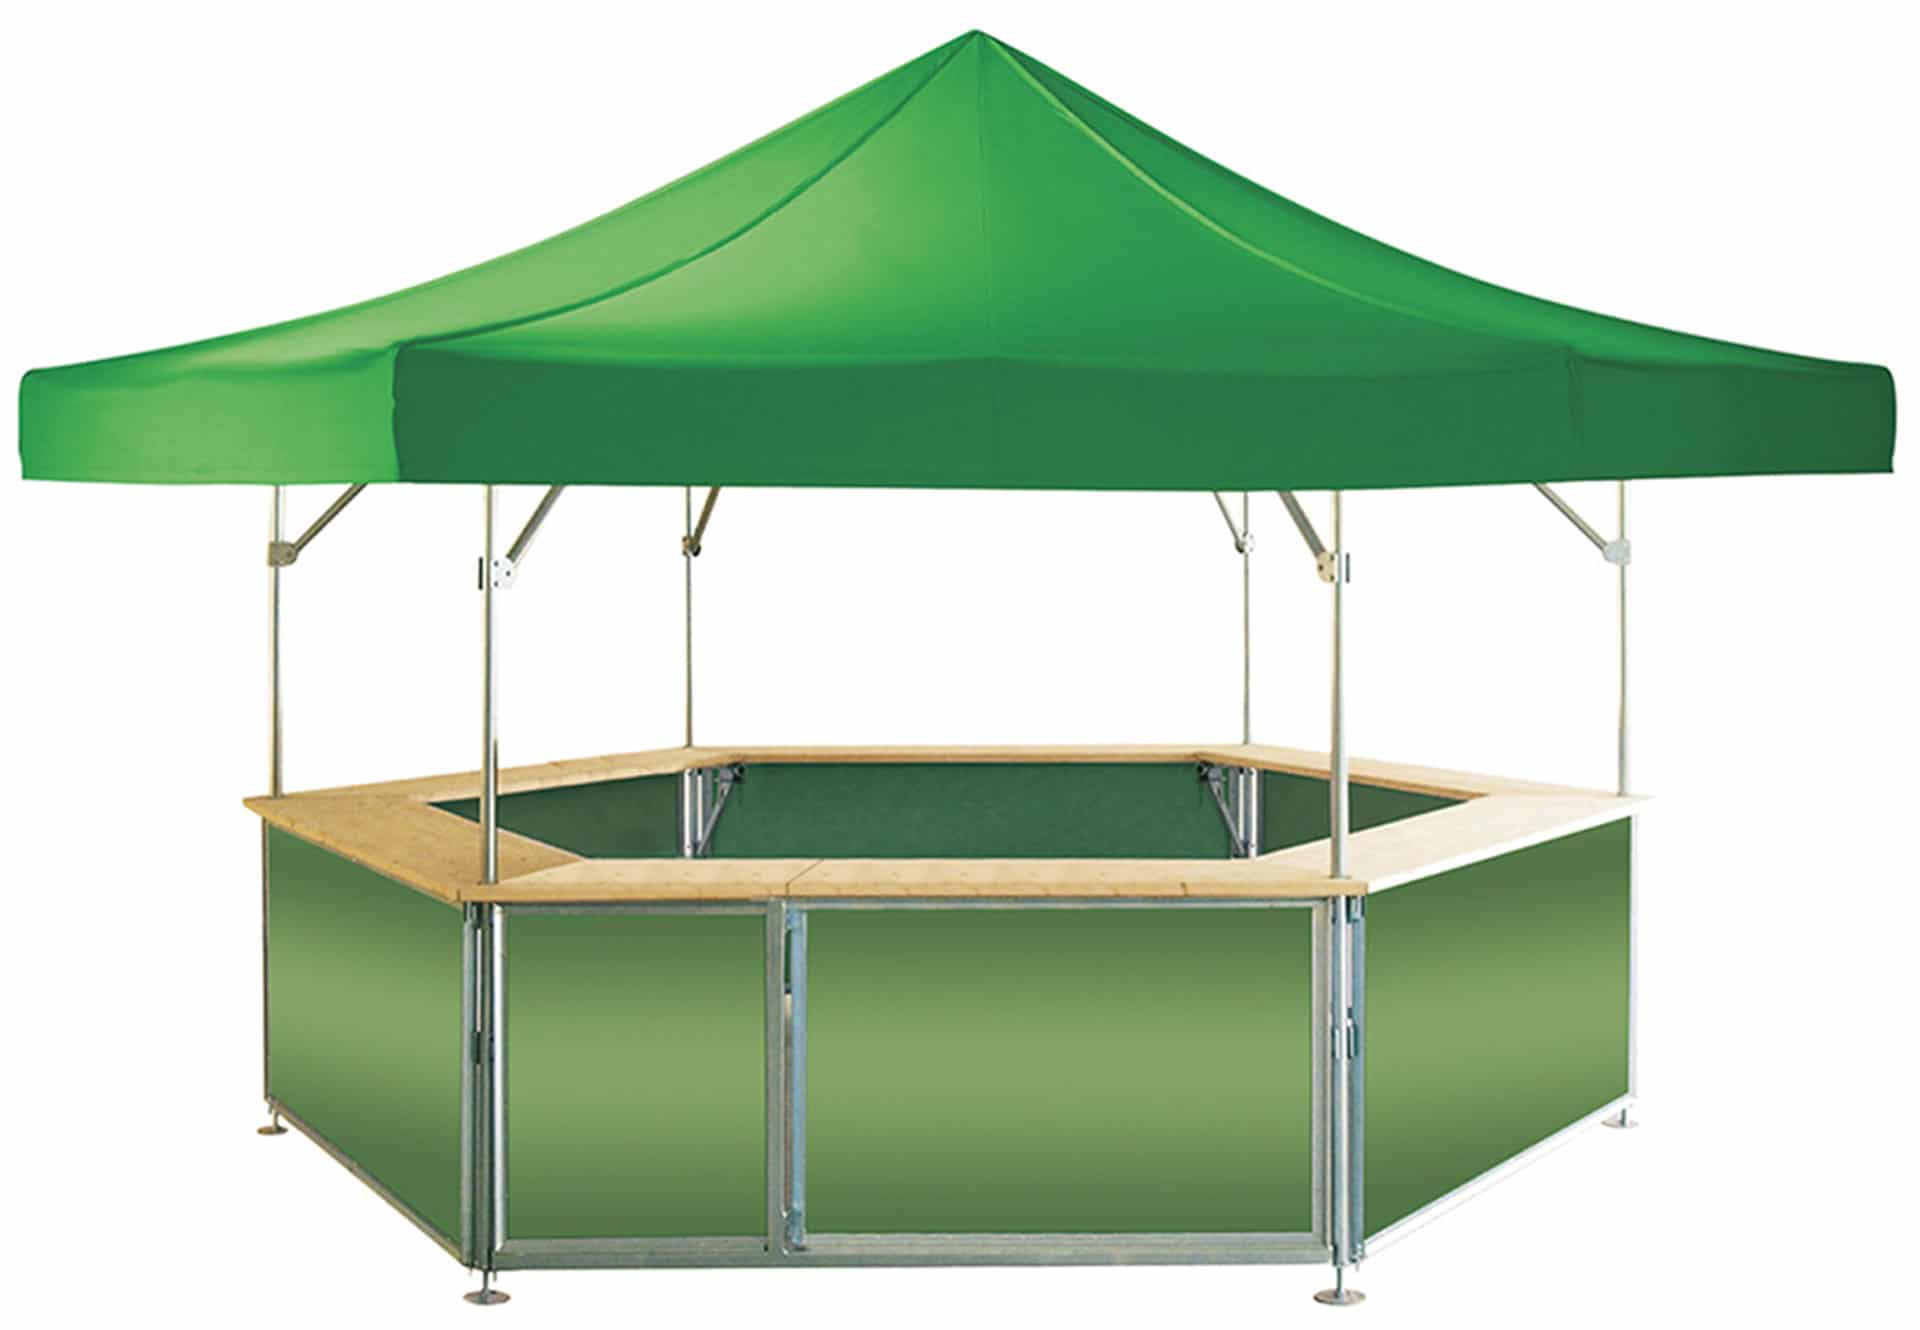 Folding Pavilion Qualytent Kiosk green 01